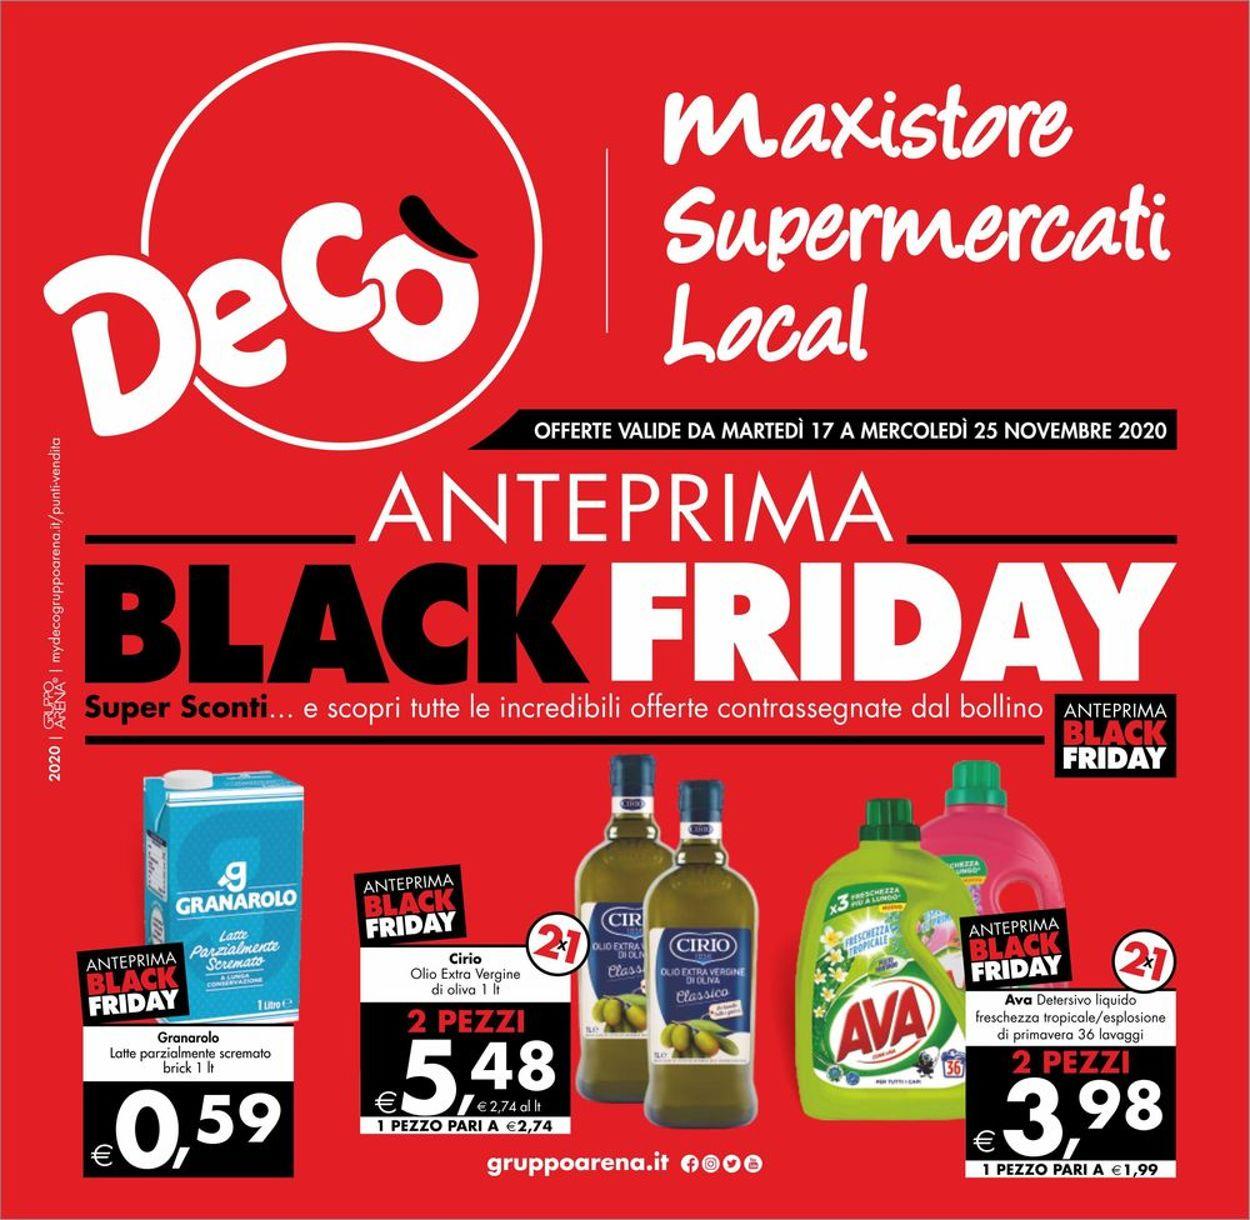 Volantino Deco - Black Friday 2020 - Offerte 17/11-25/11/2020